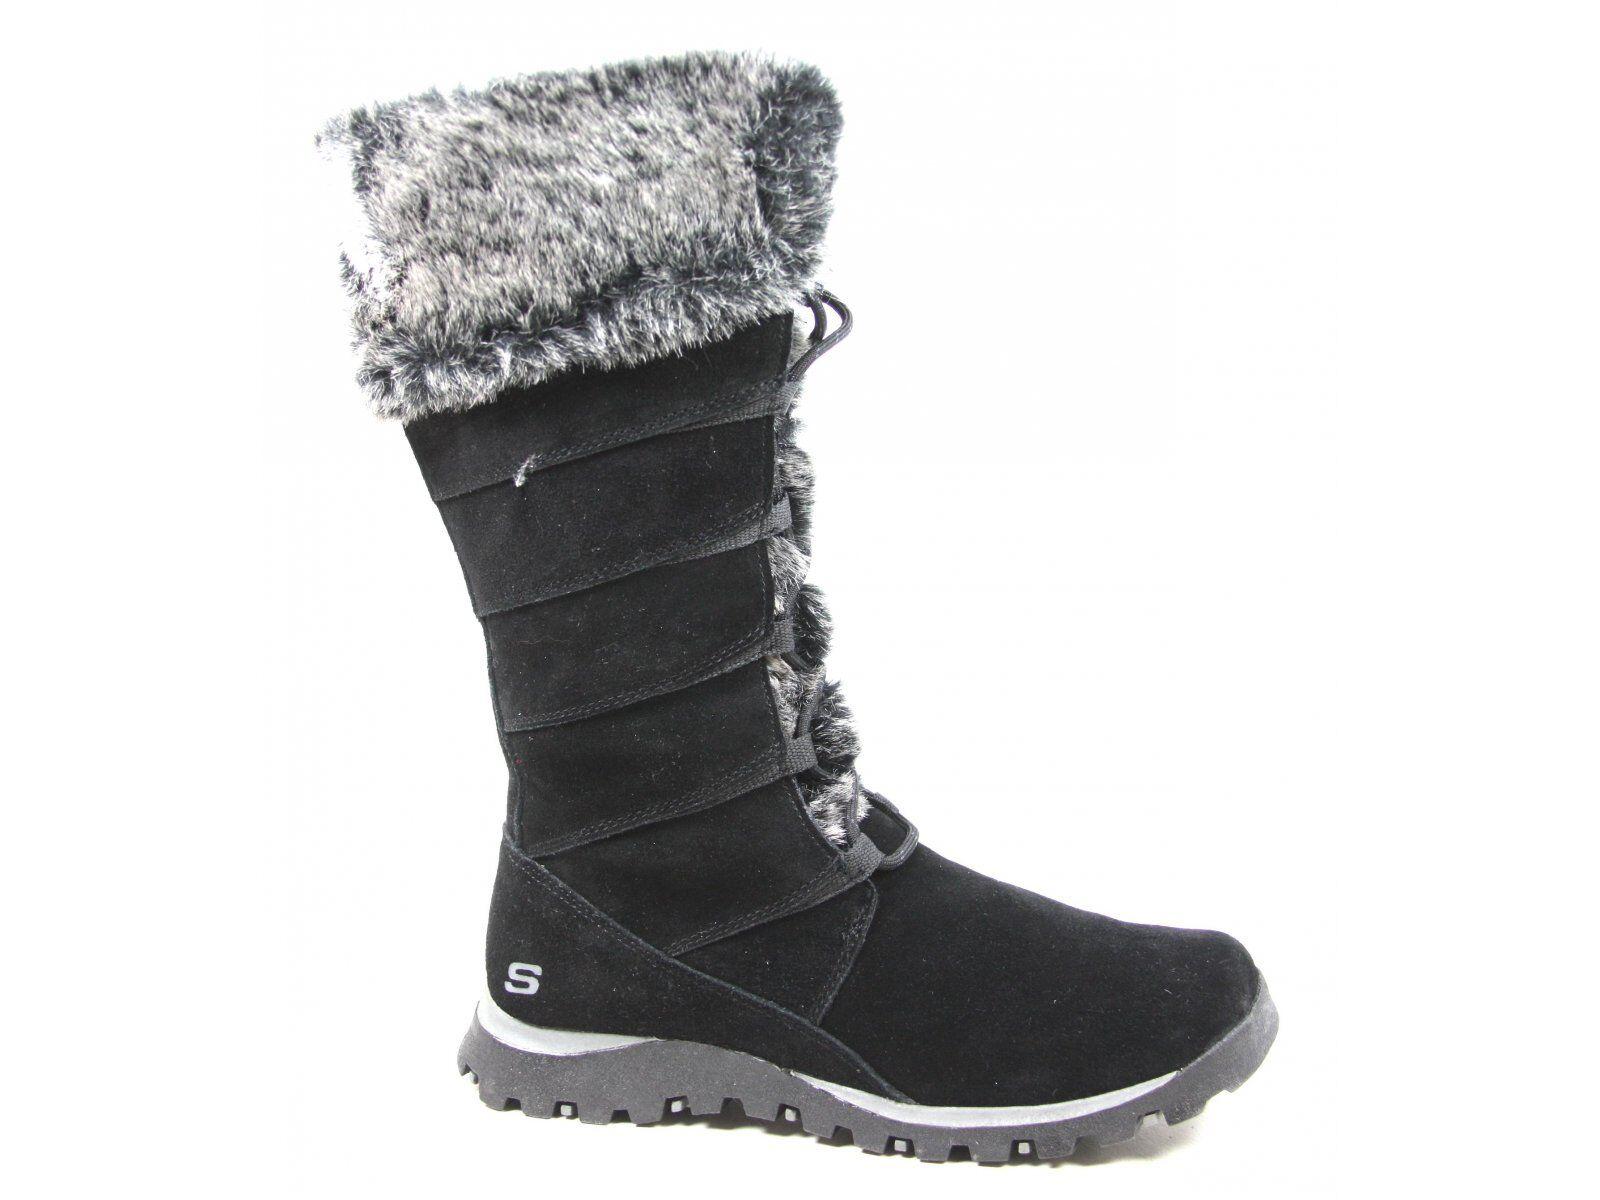 Skechers Buy Skechers Trainers Shoes Amp Boots Ebay